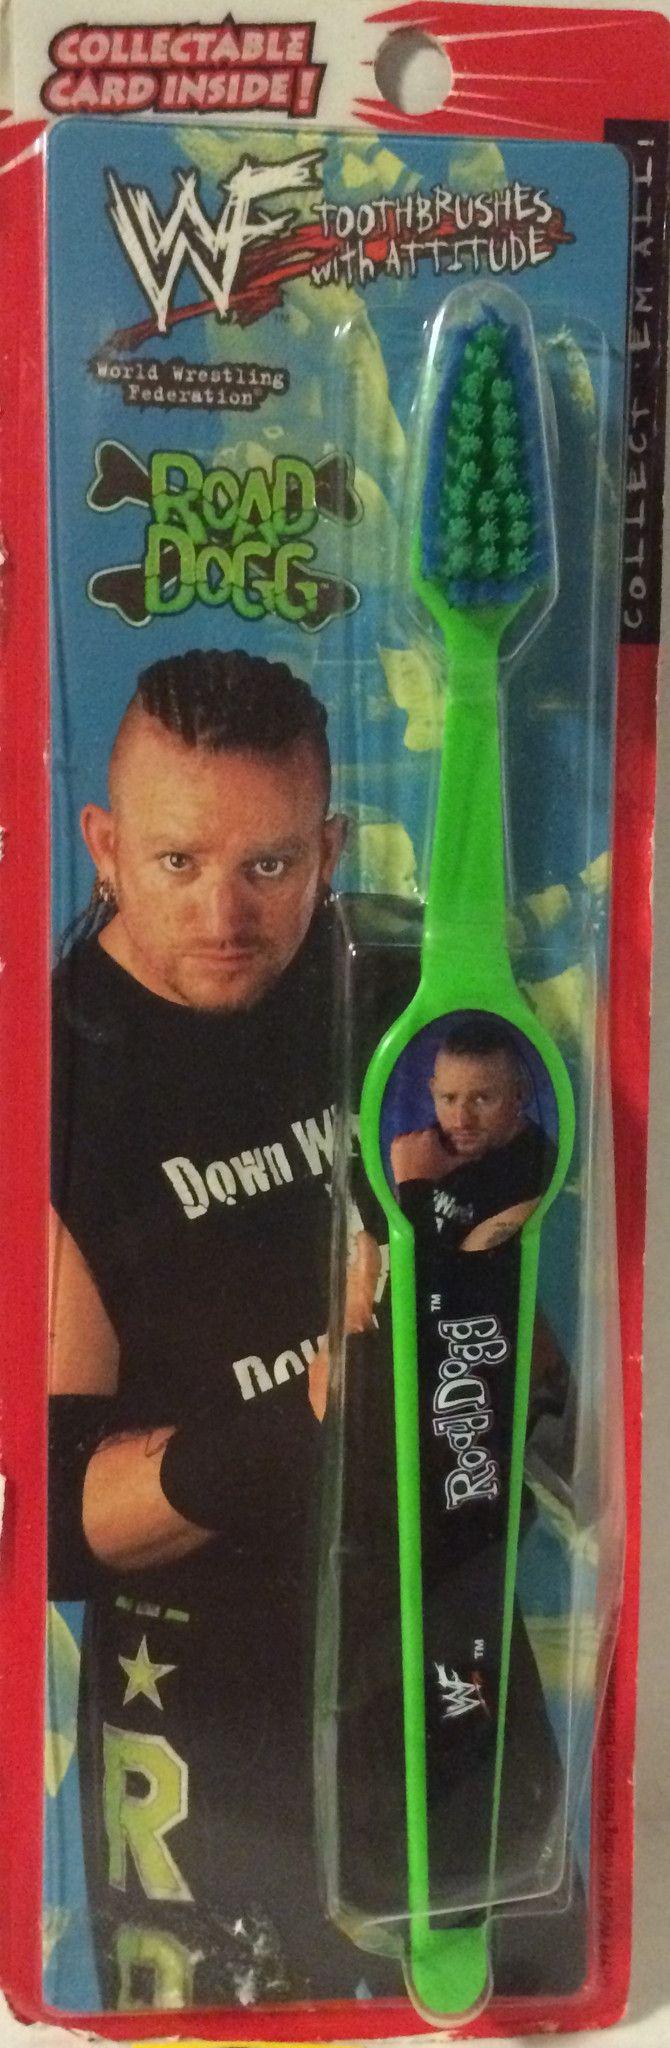 (TAS004753) - 1999 WWF WWE Wrestling Toothbrush - Road Dogg (DX)